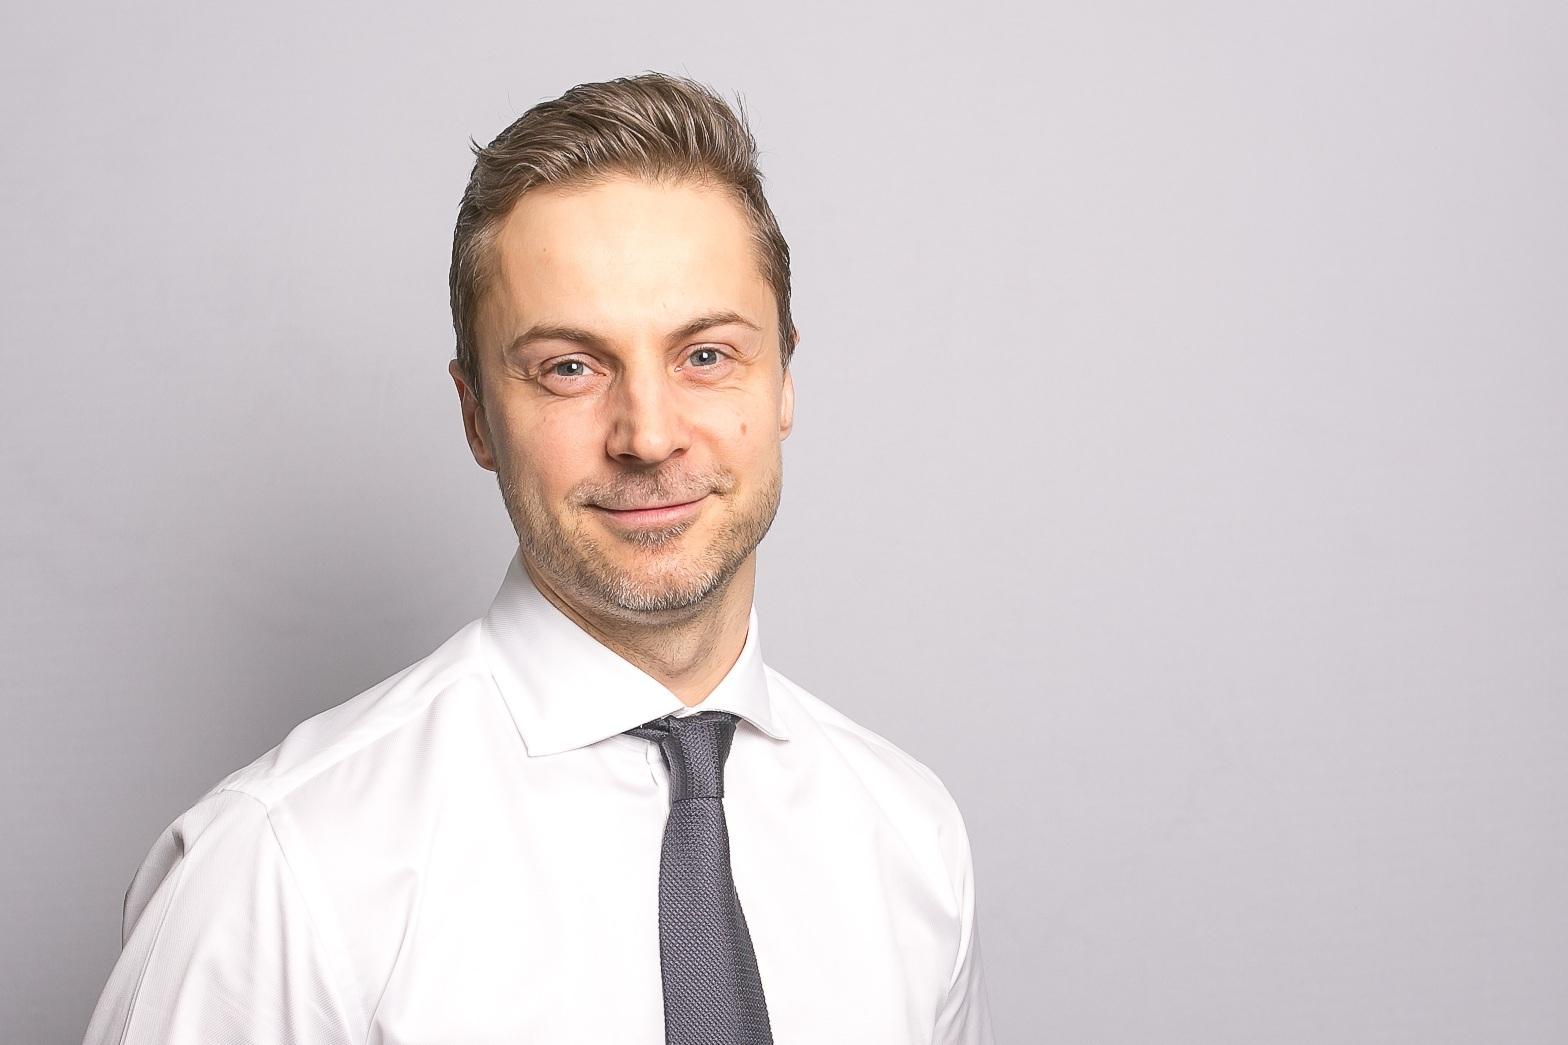 Markku Jussila, Nordic Countries   Co-Founder, Director  New Business Development  040 532 2212   markku.jussila@springvest.fi